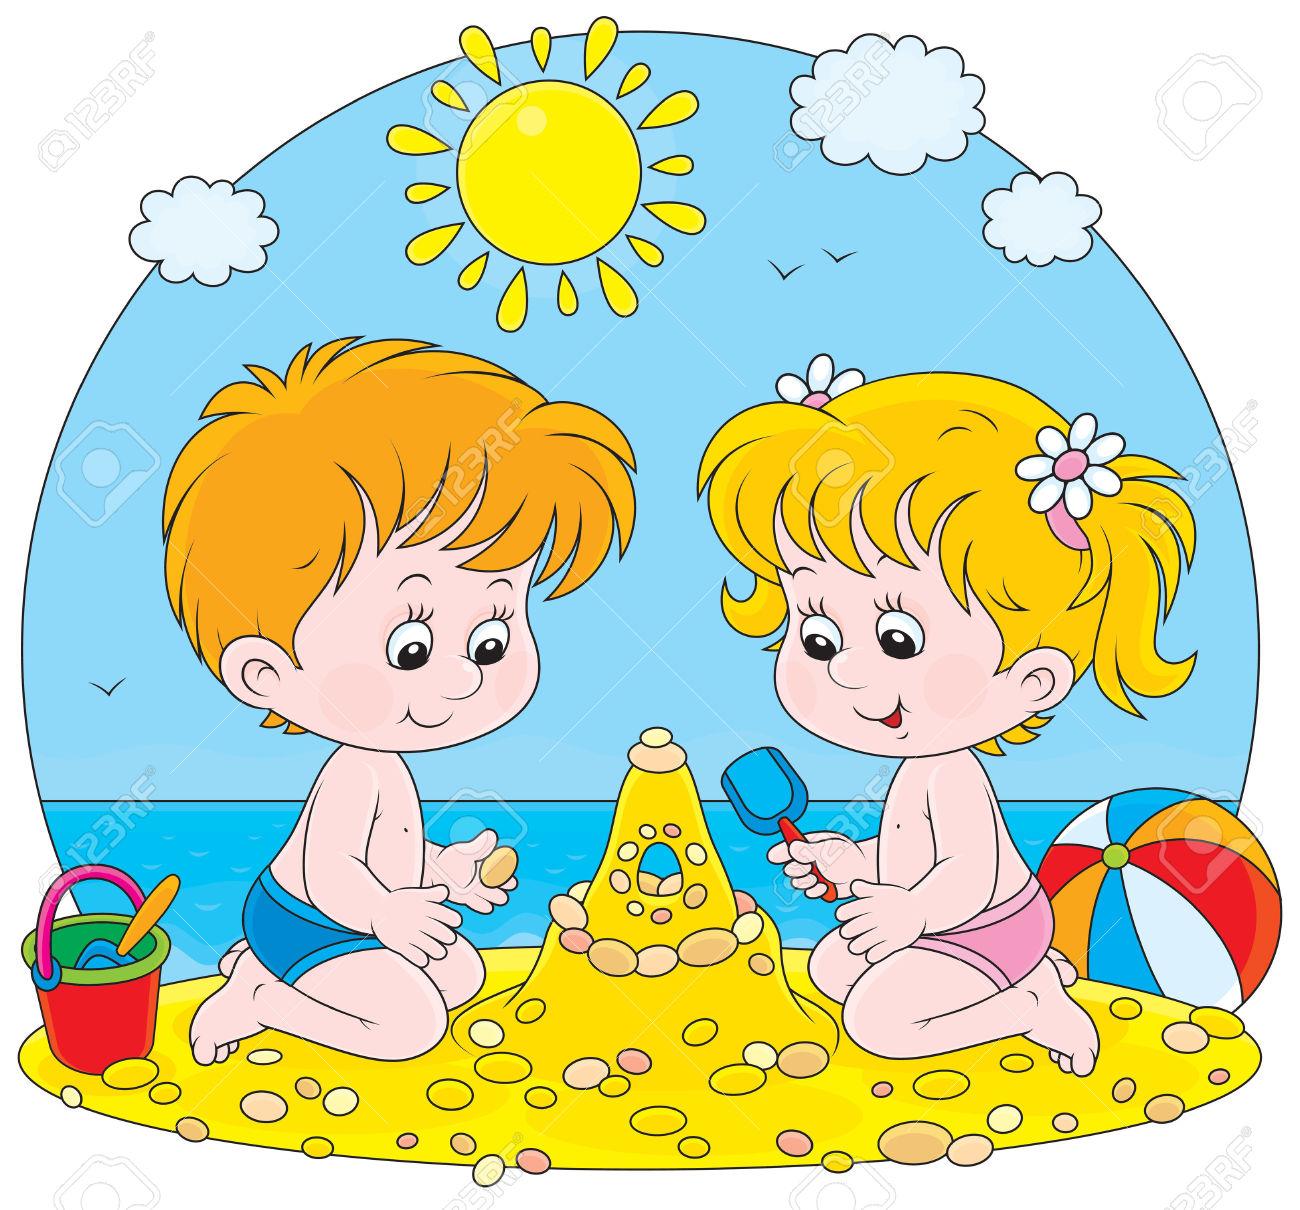 Girl And Boy Building A Sand Castle On A Beach Royalty Free.